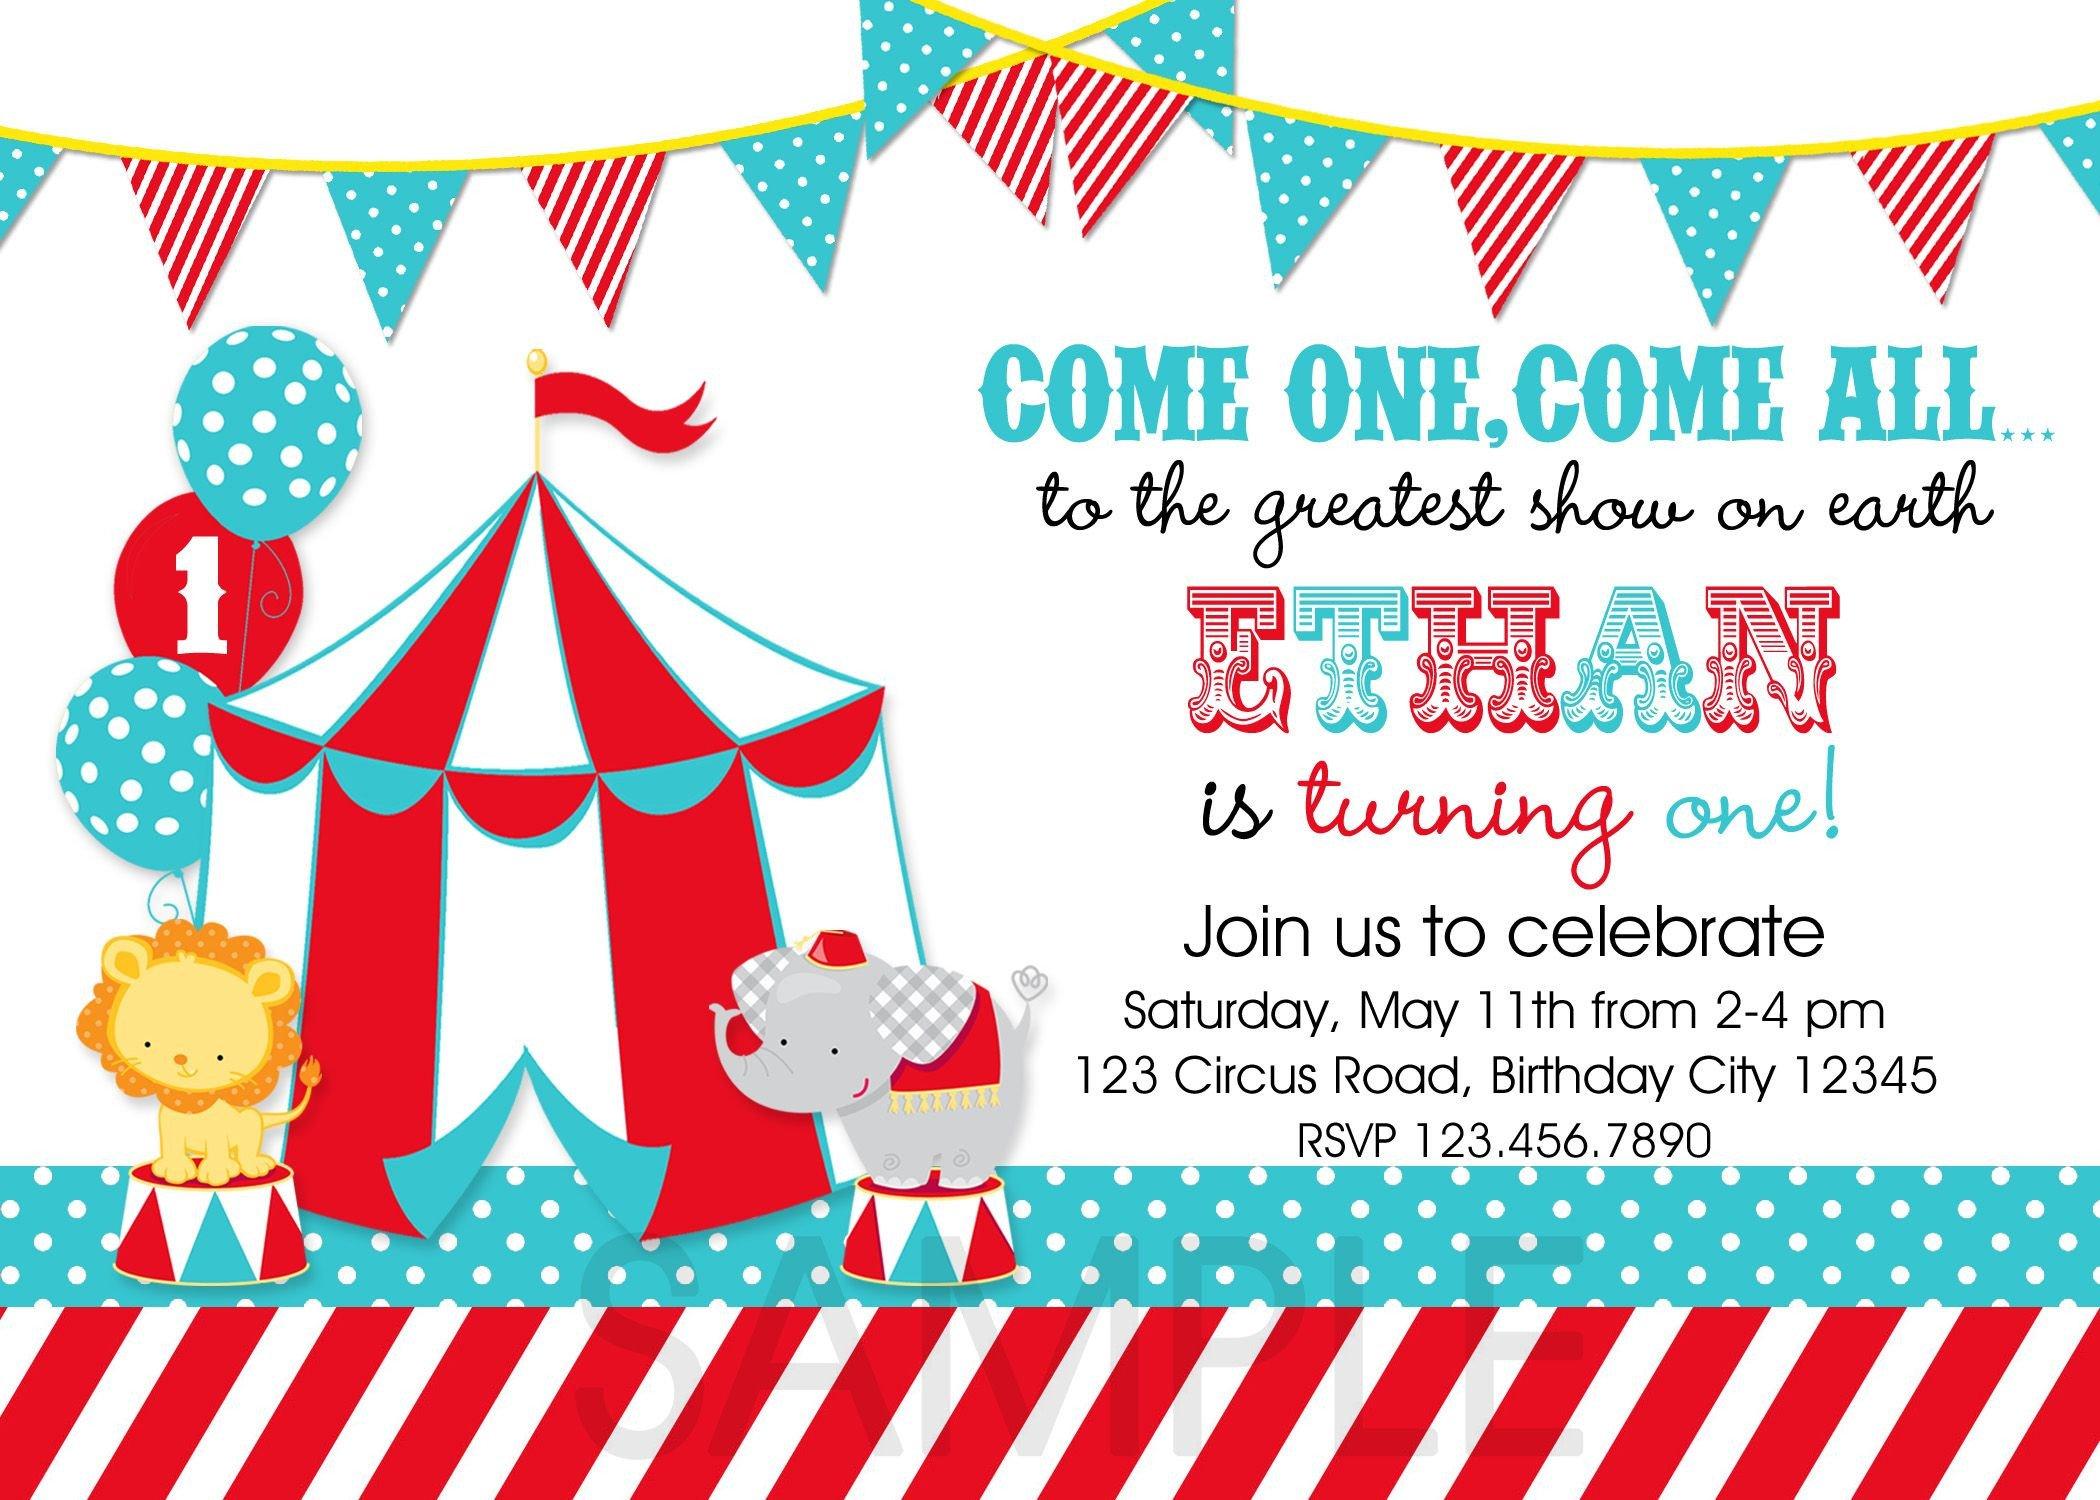 Carnival Invitation Template Free Circus Party Invitations Template 3zcfy9xw